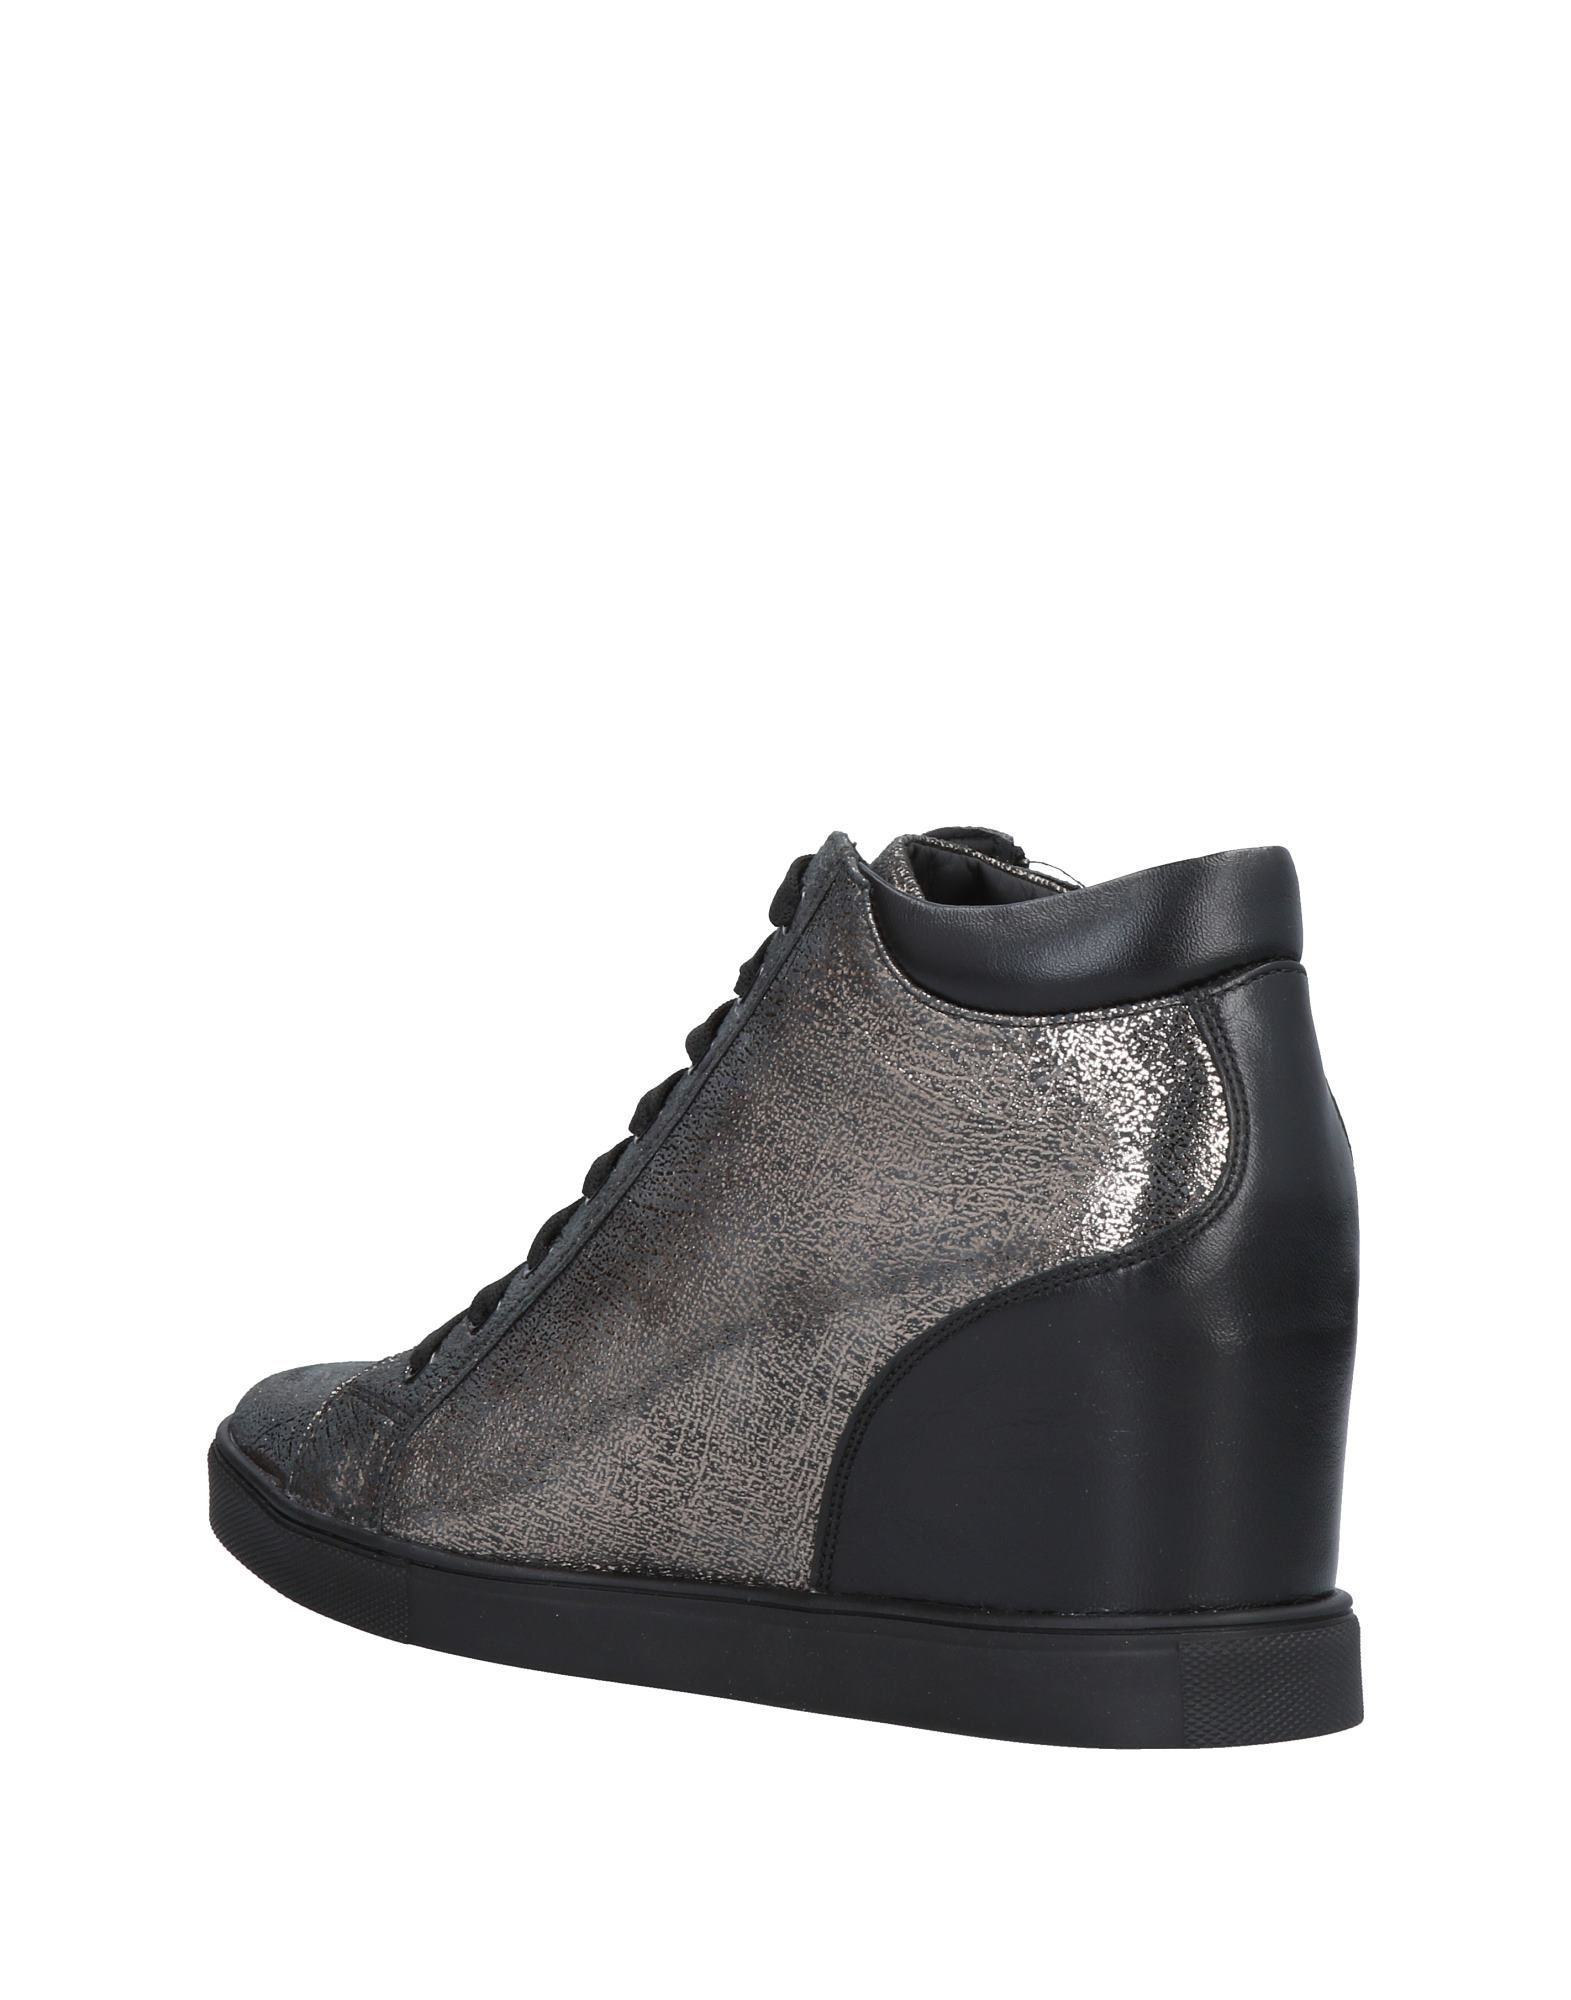 Maimai Sneakers Damen  11474474SO 11474474SO 11474474SO Gute Qualität beliebte Schuhe ead30b